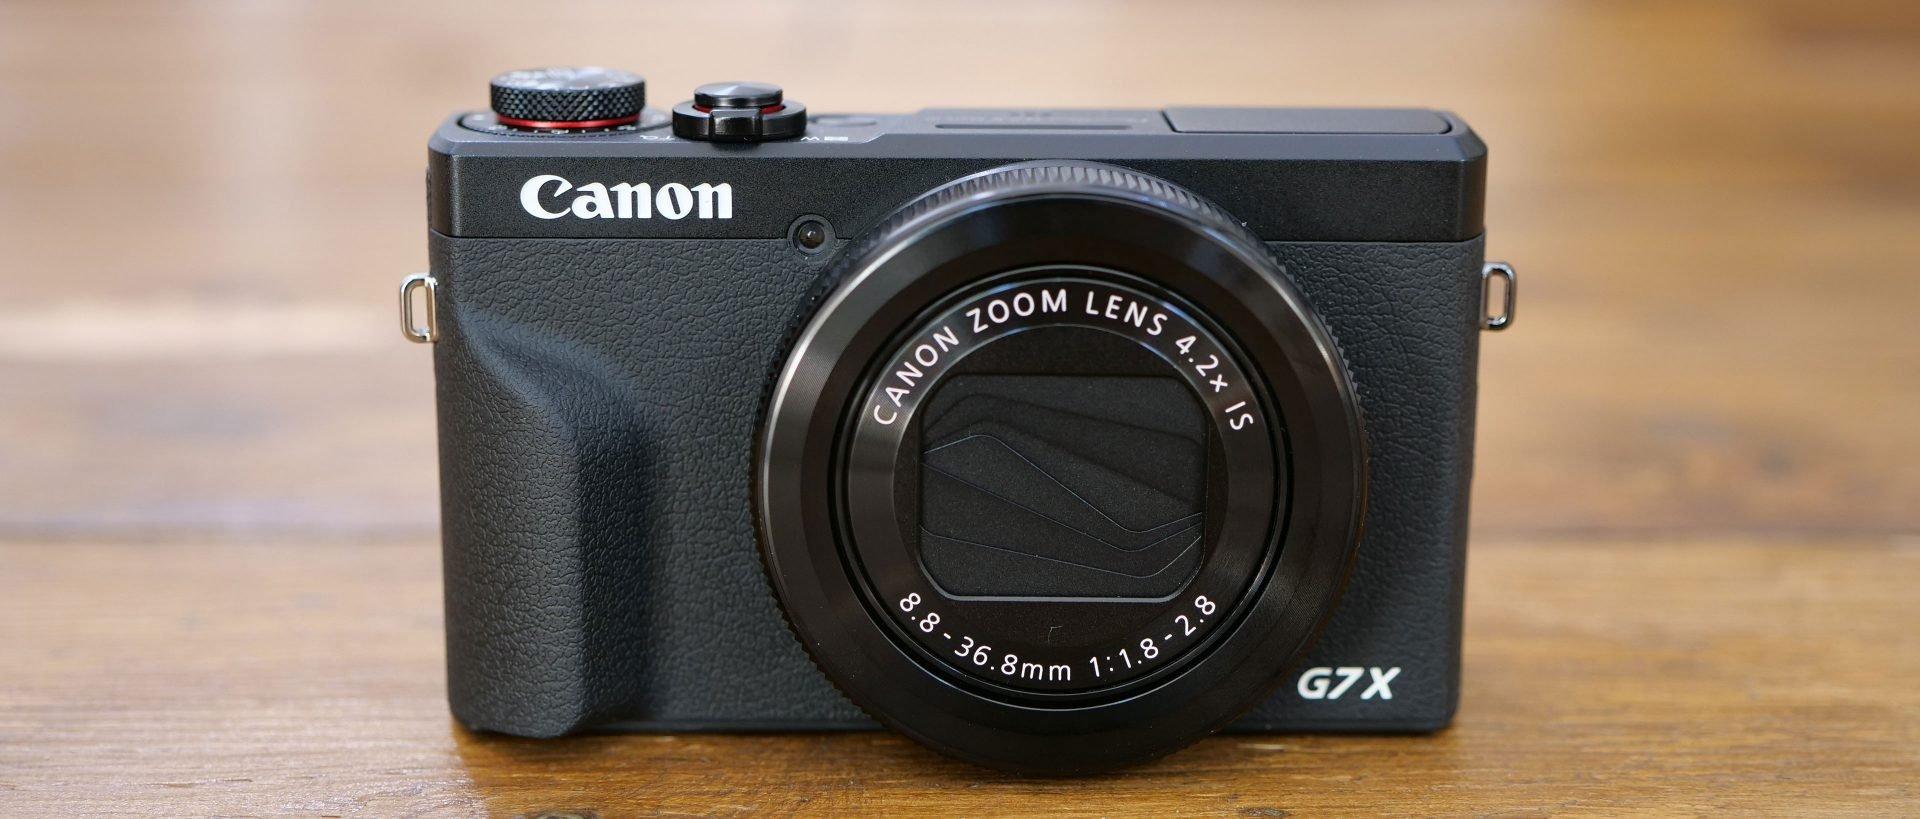 canon-powershot-g7x-iii-header1